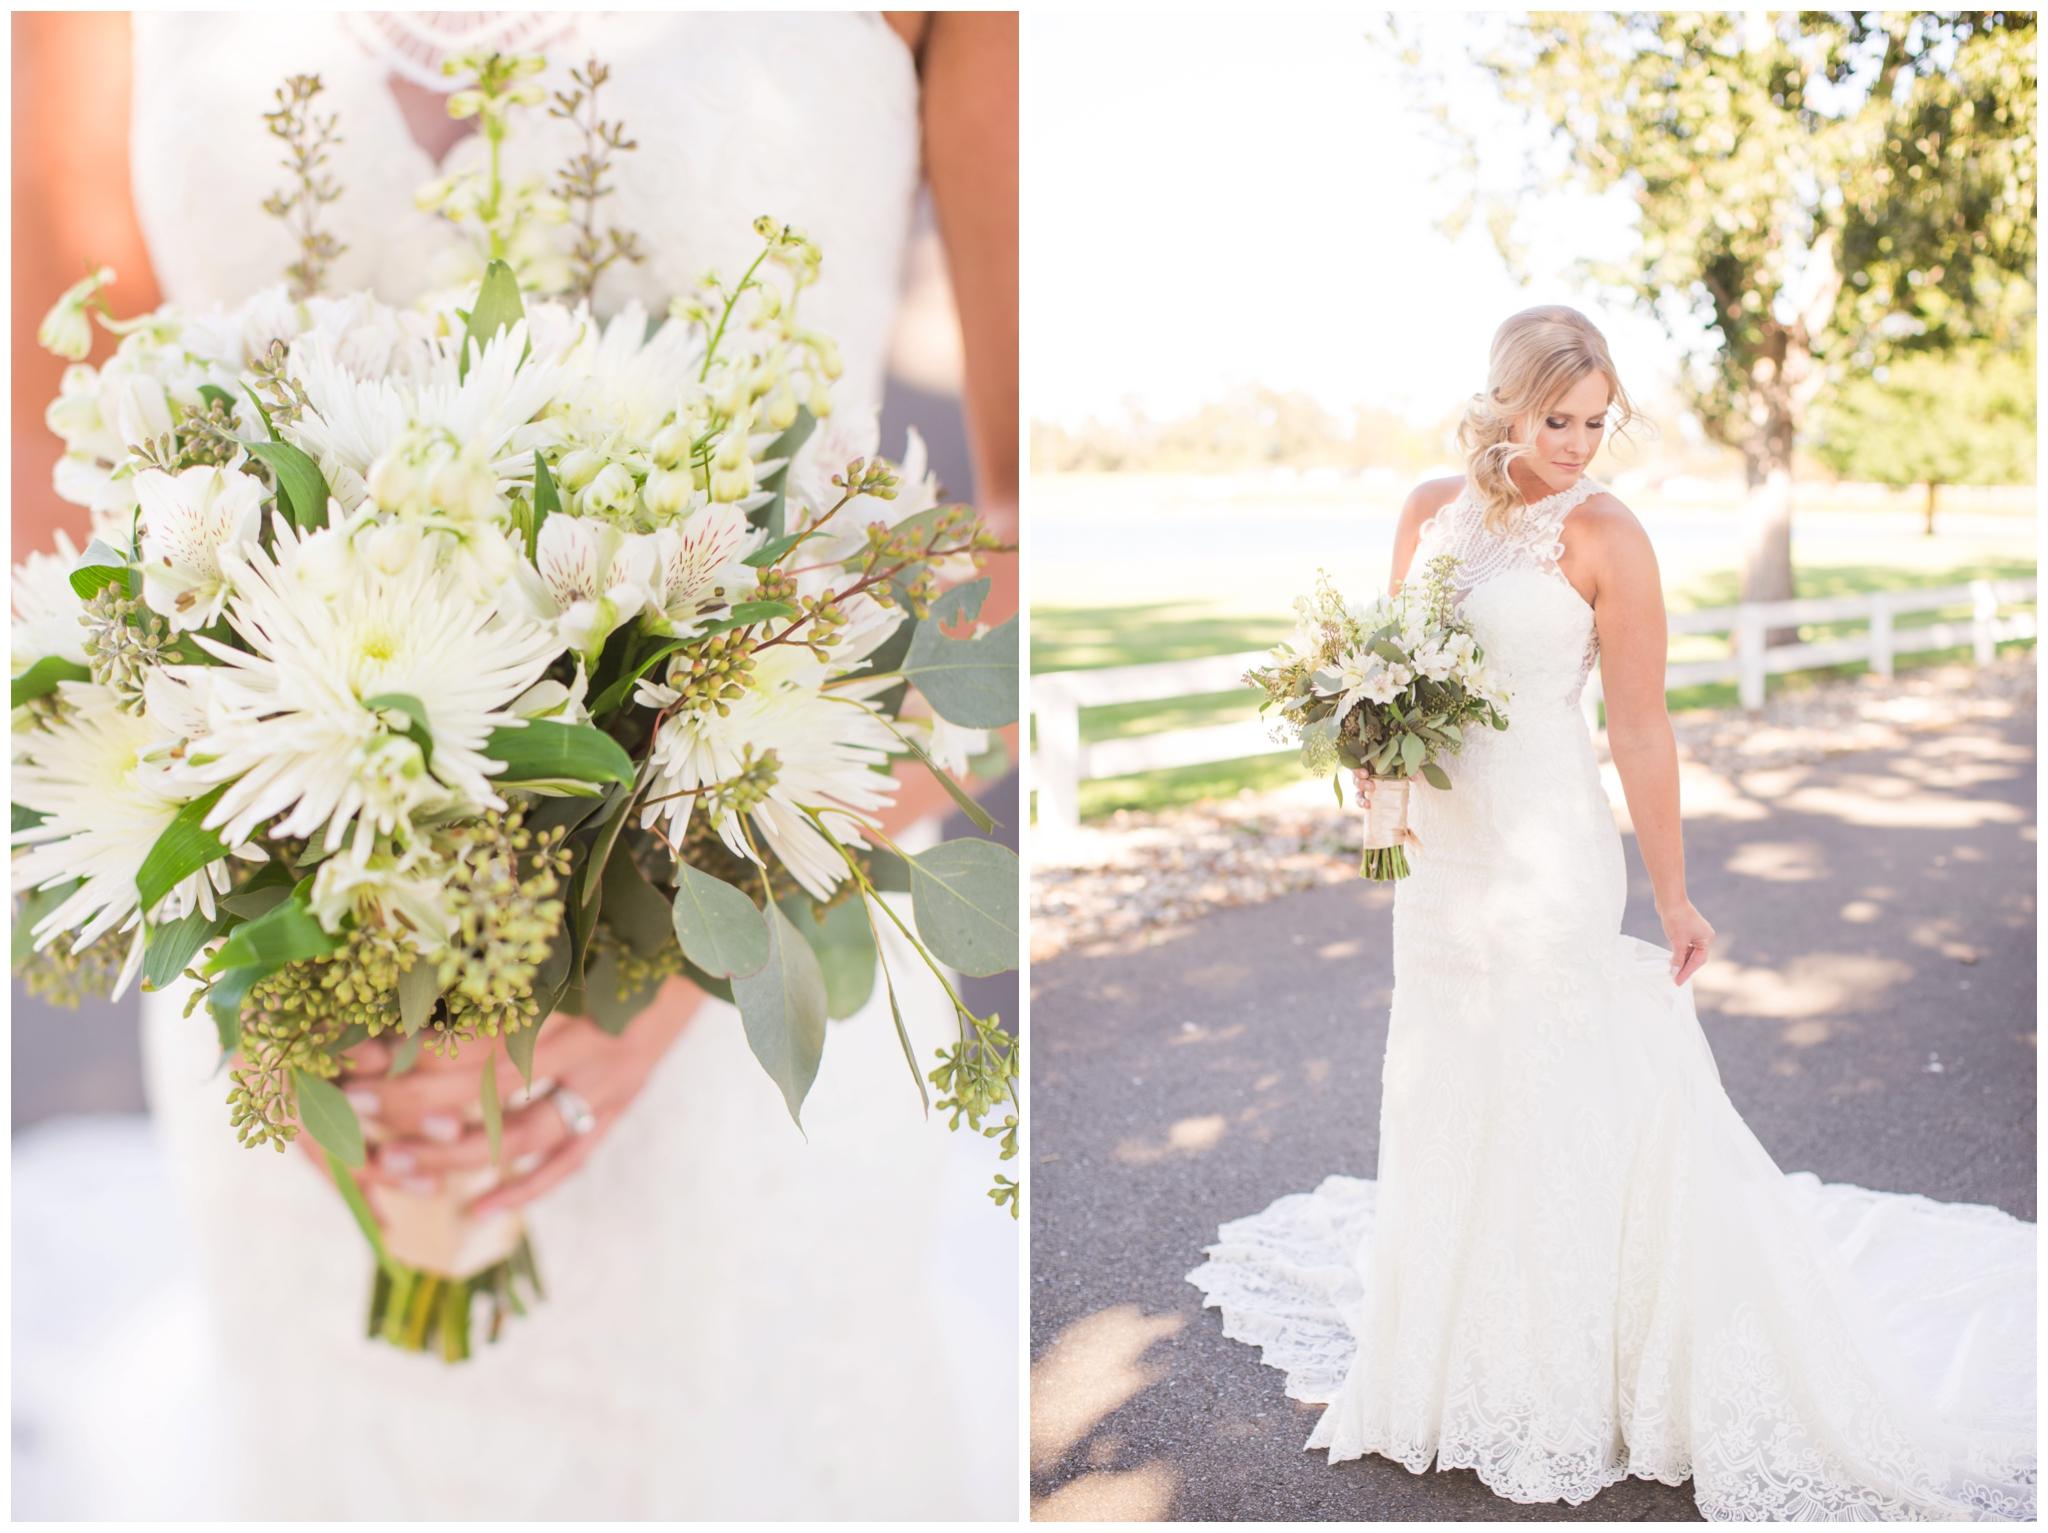 kassie_heath_cottonwood_wedding_blog_0016.jpg